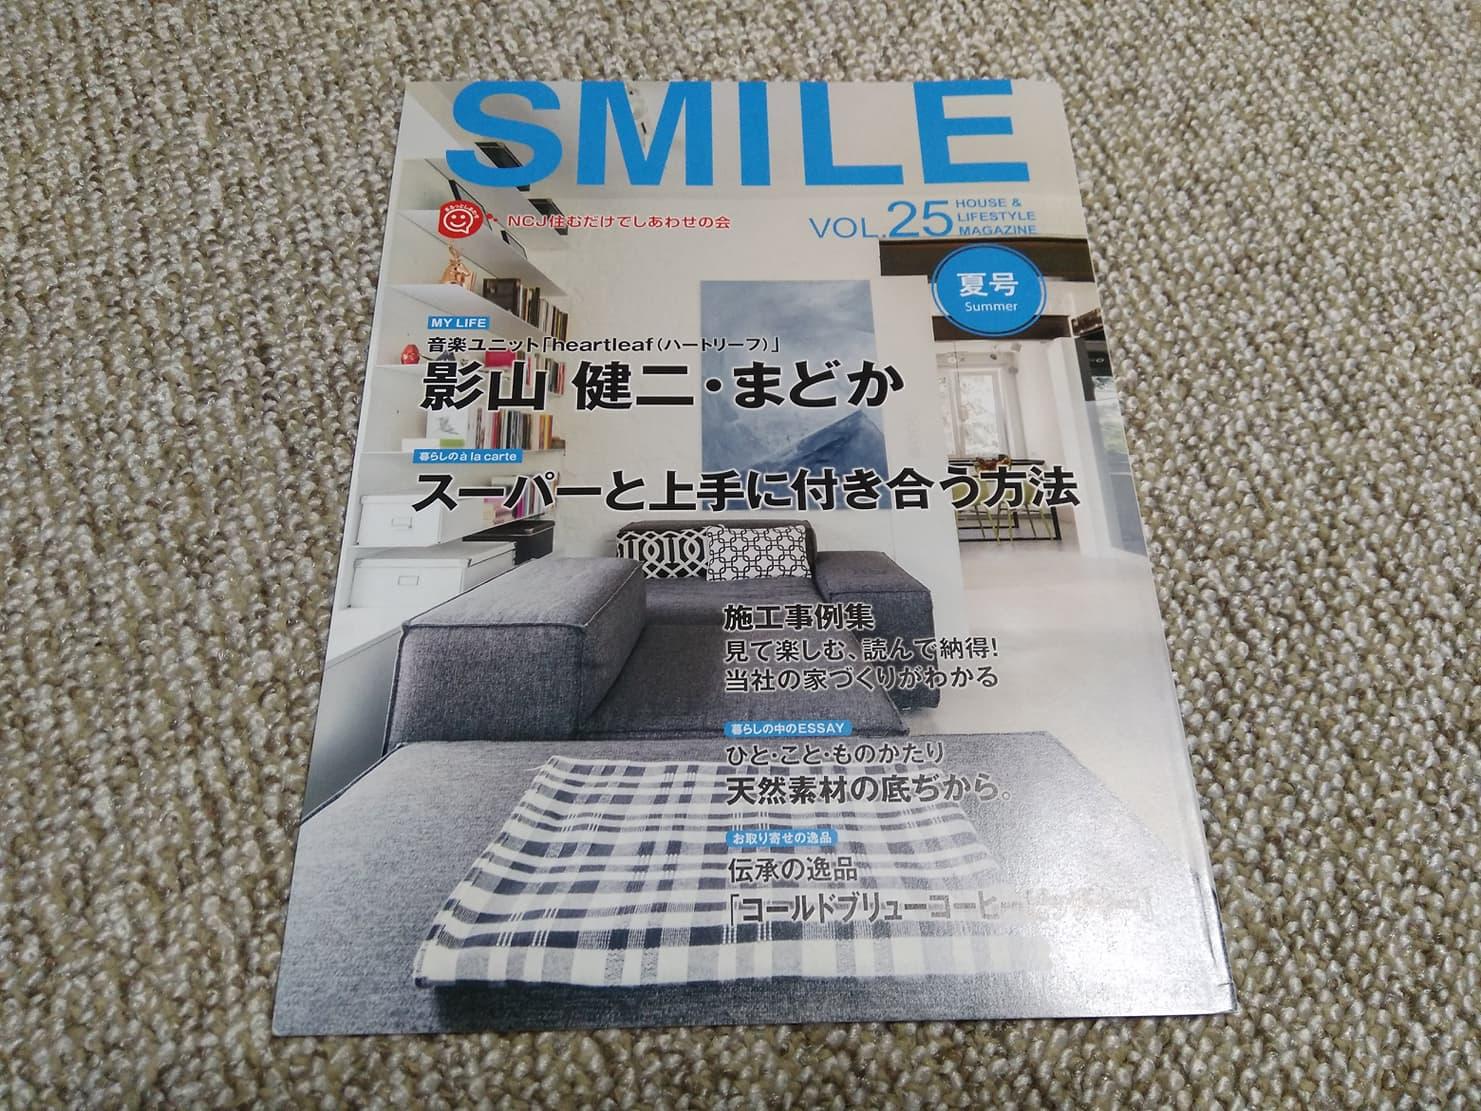 HOUSE&LIFESTYLE MAGAZINE 「SMILE」の夏号にheartleafが掲載されました